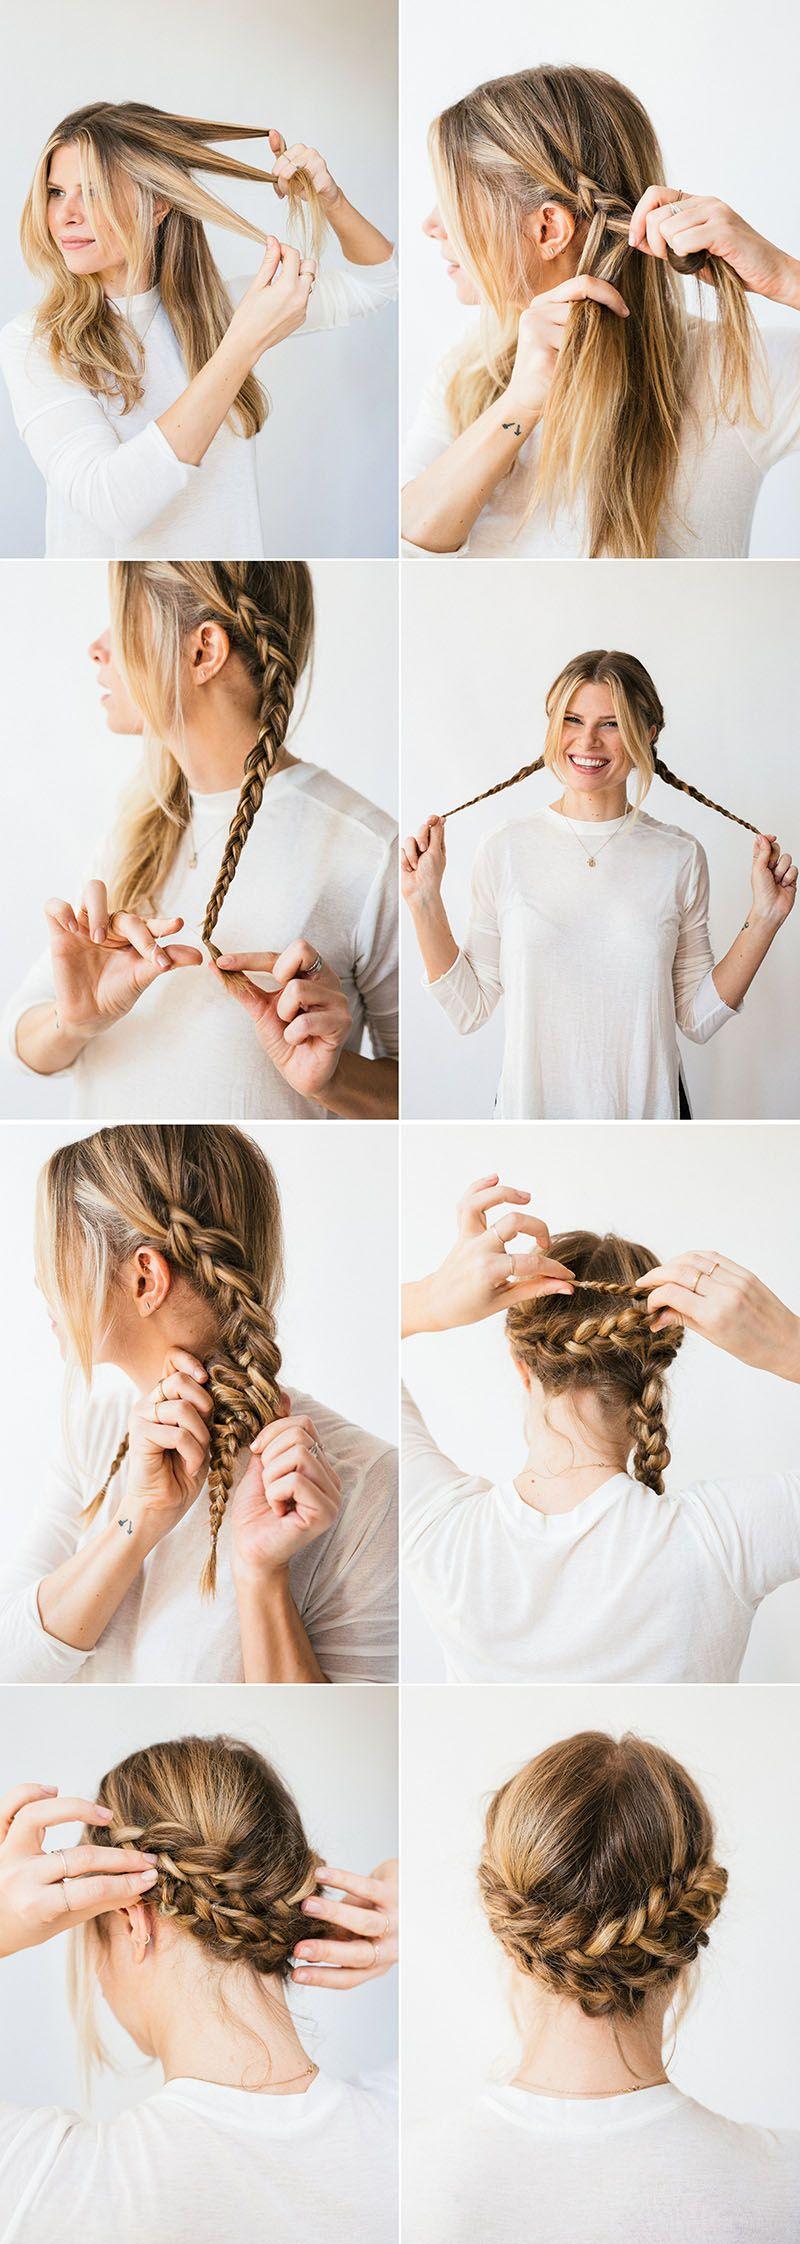 horseshoe braid | beauty tutorials | hair styles, braided